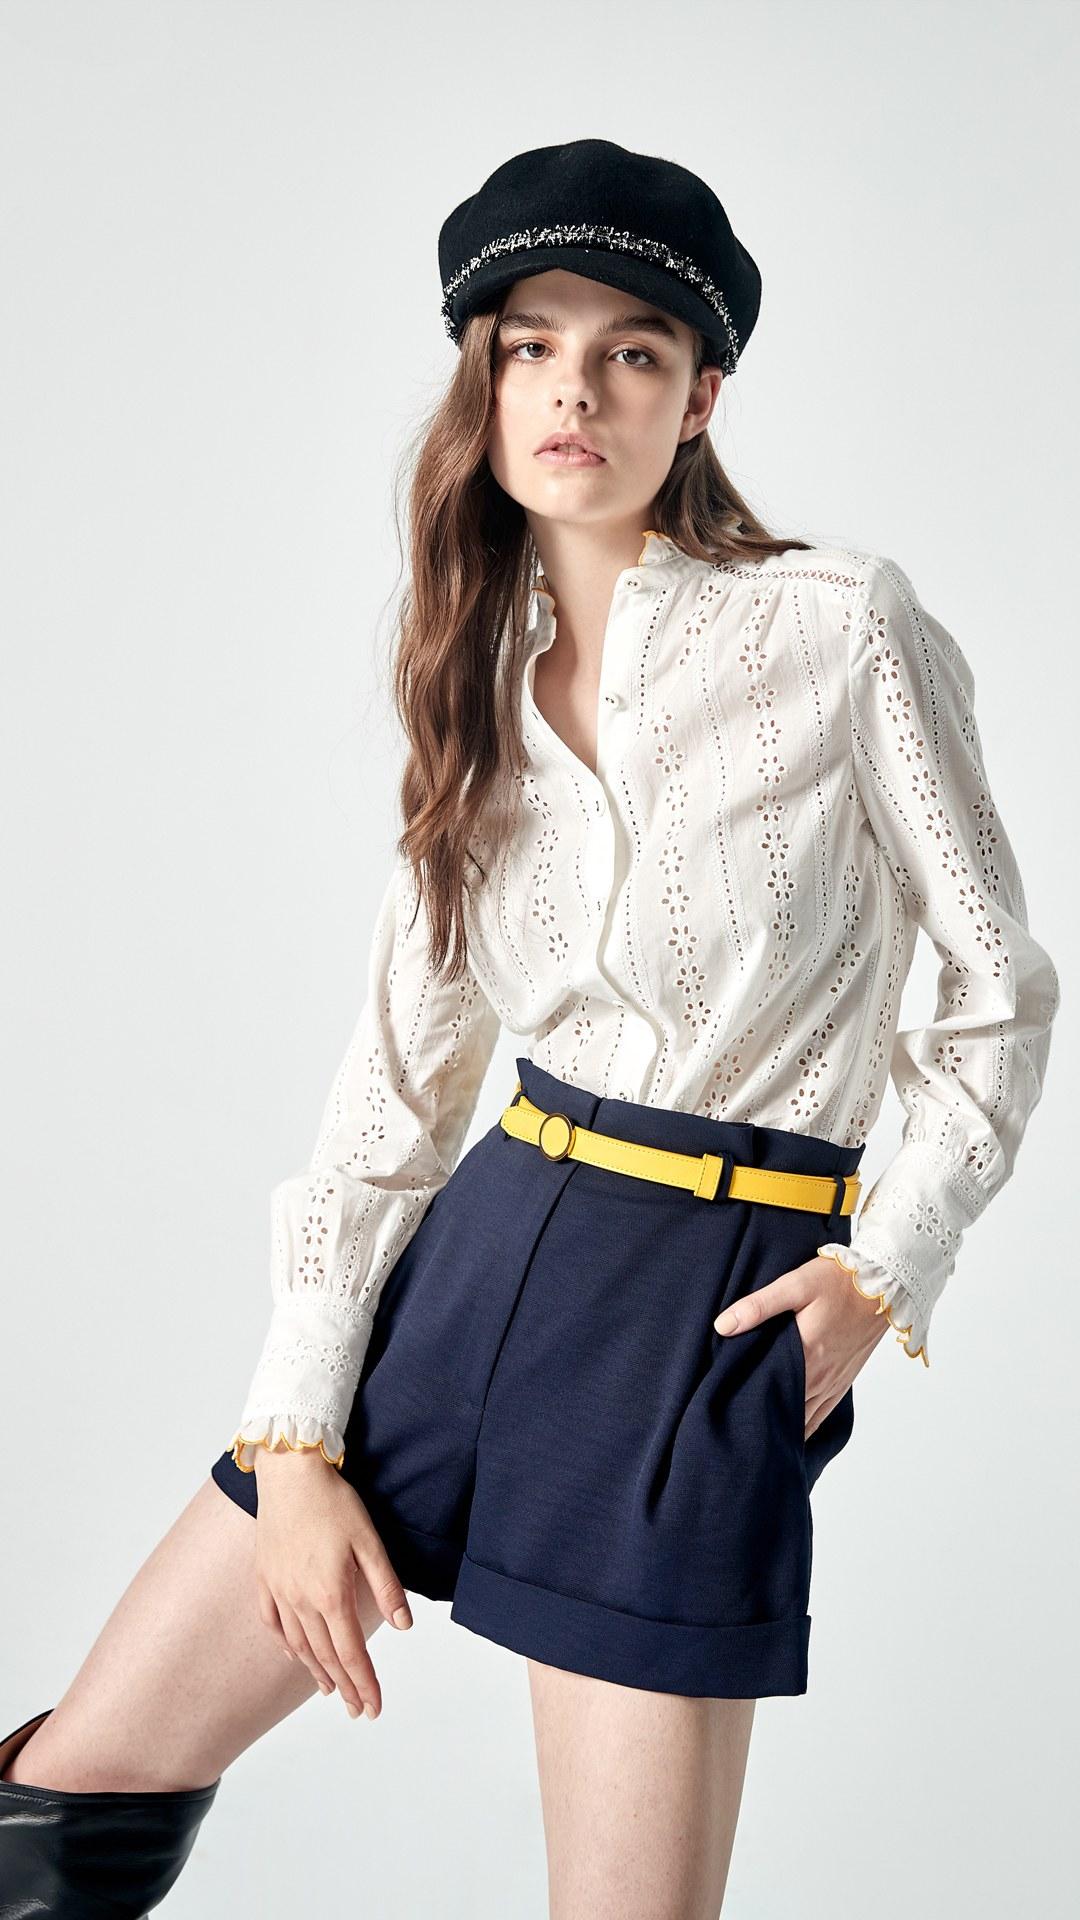 iROO輕奢時尚女裝洋裝│輕奢華 週時尚 愛自己 不打折